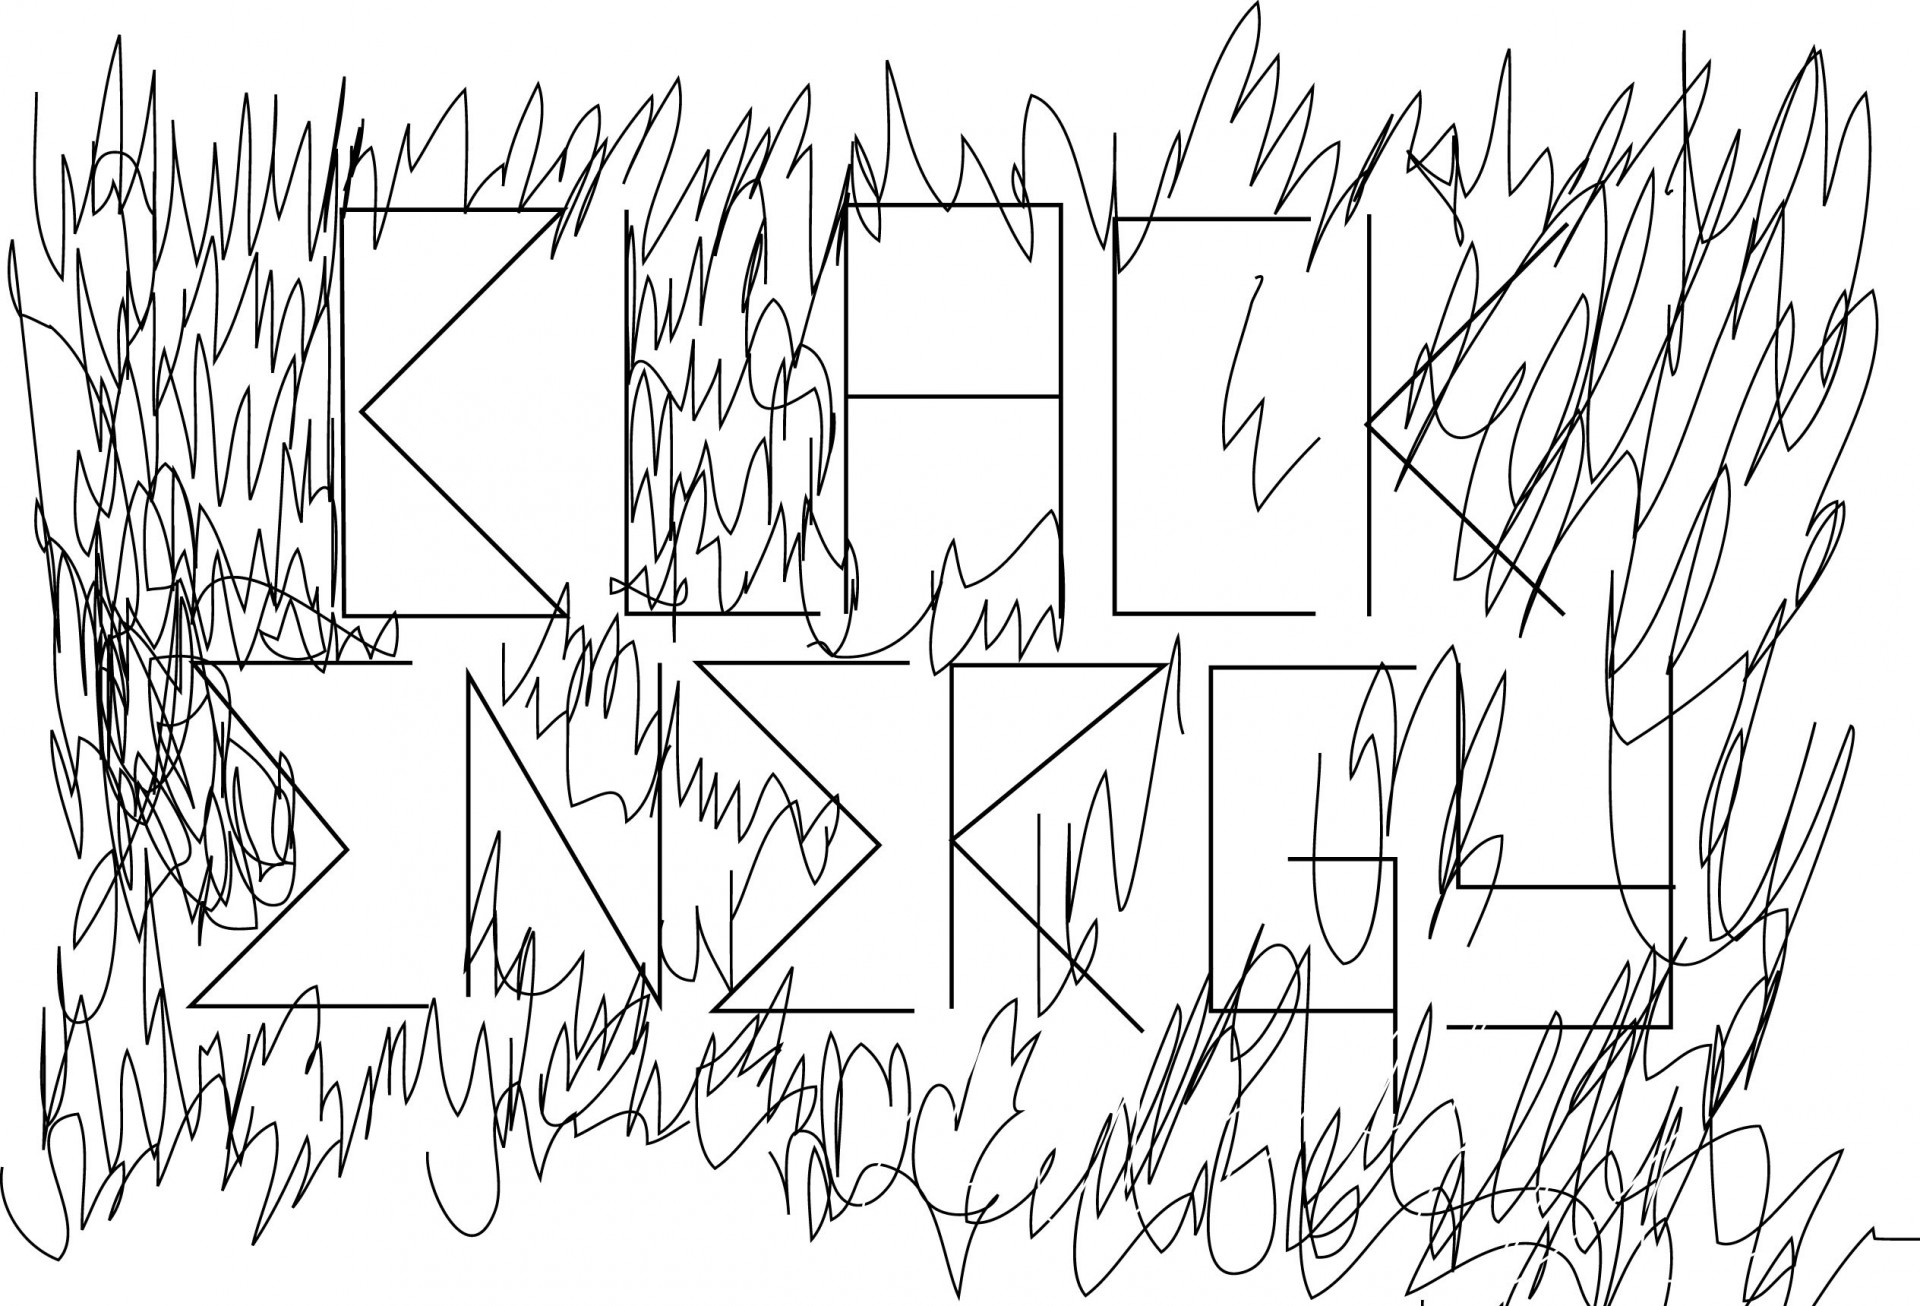 Kunsthalle Bozen Black Energy